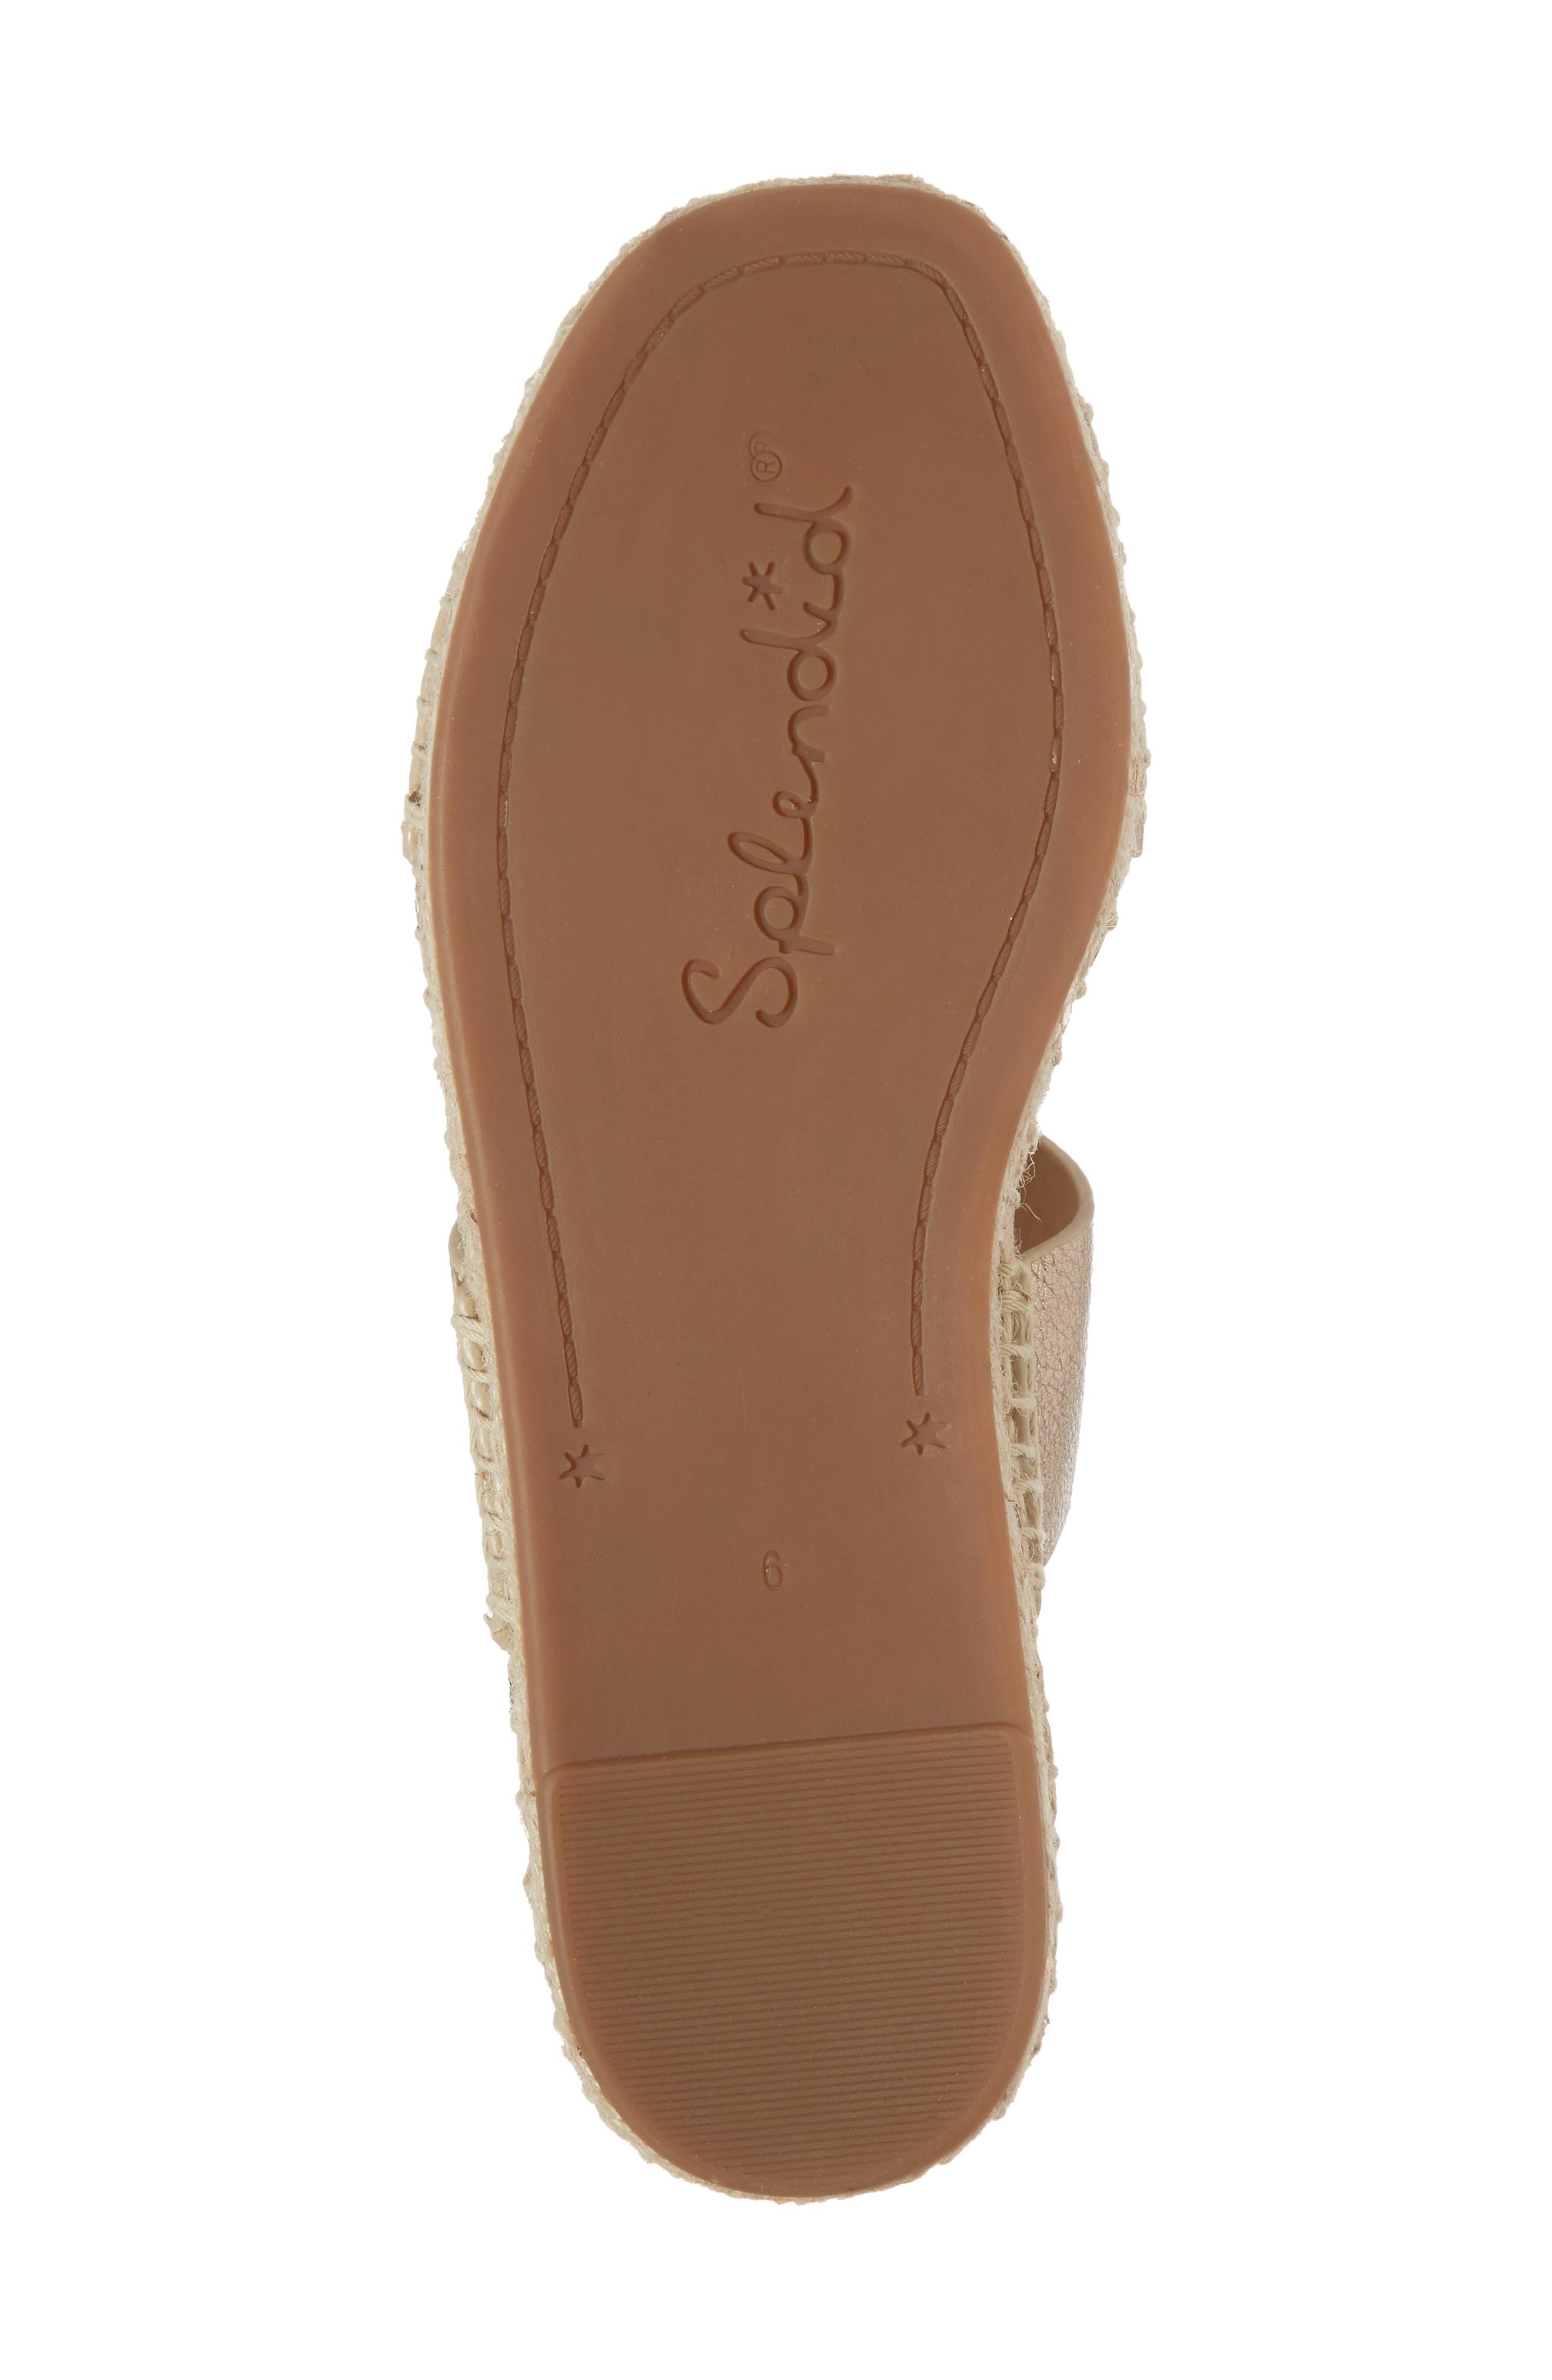 Farley Espadrille Sandal,                             Alternate thumbnail 6, color,                             Champagne Leather